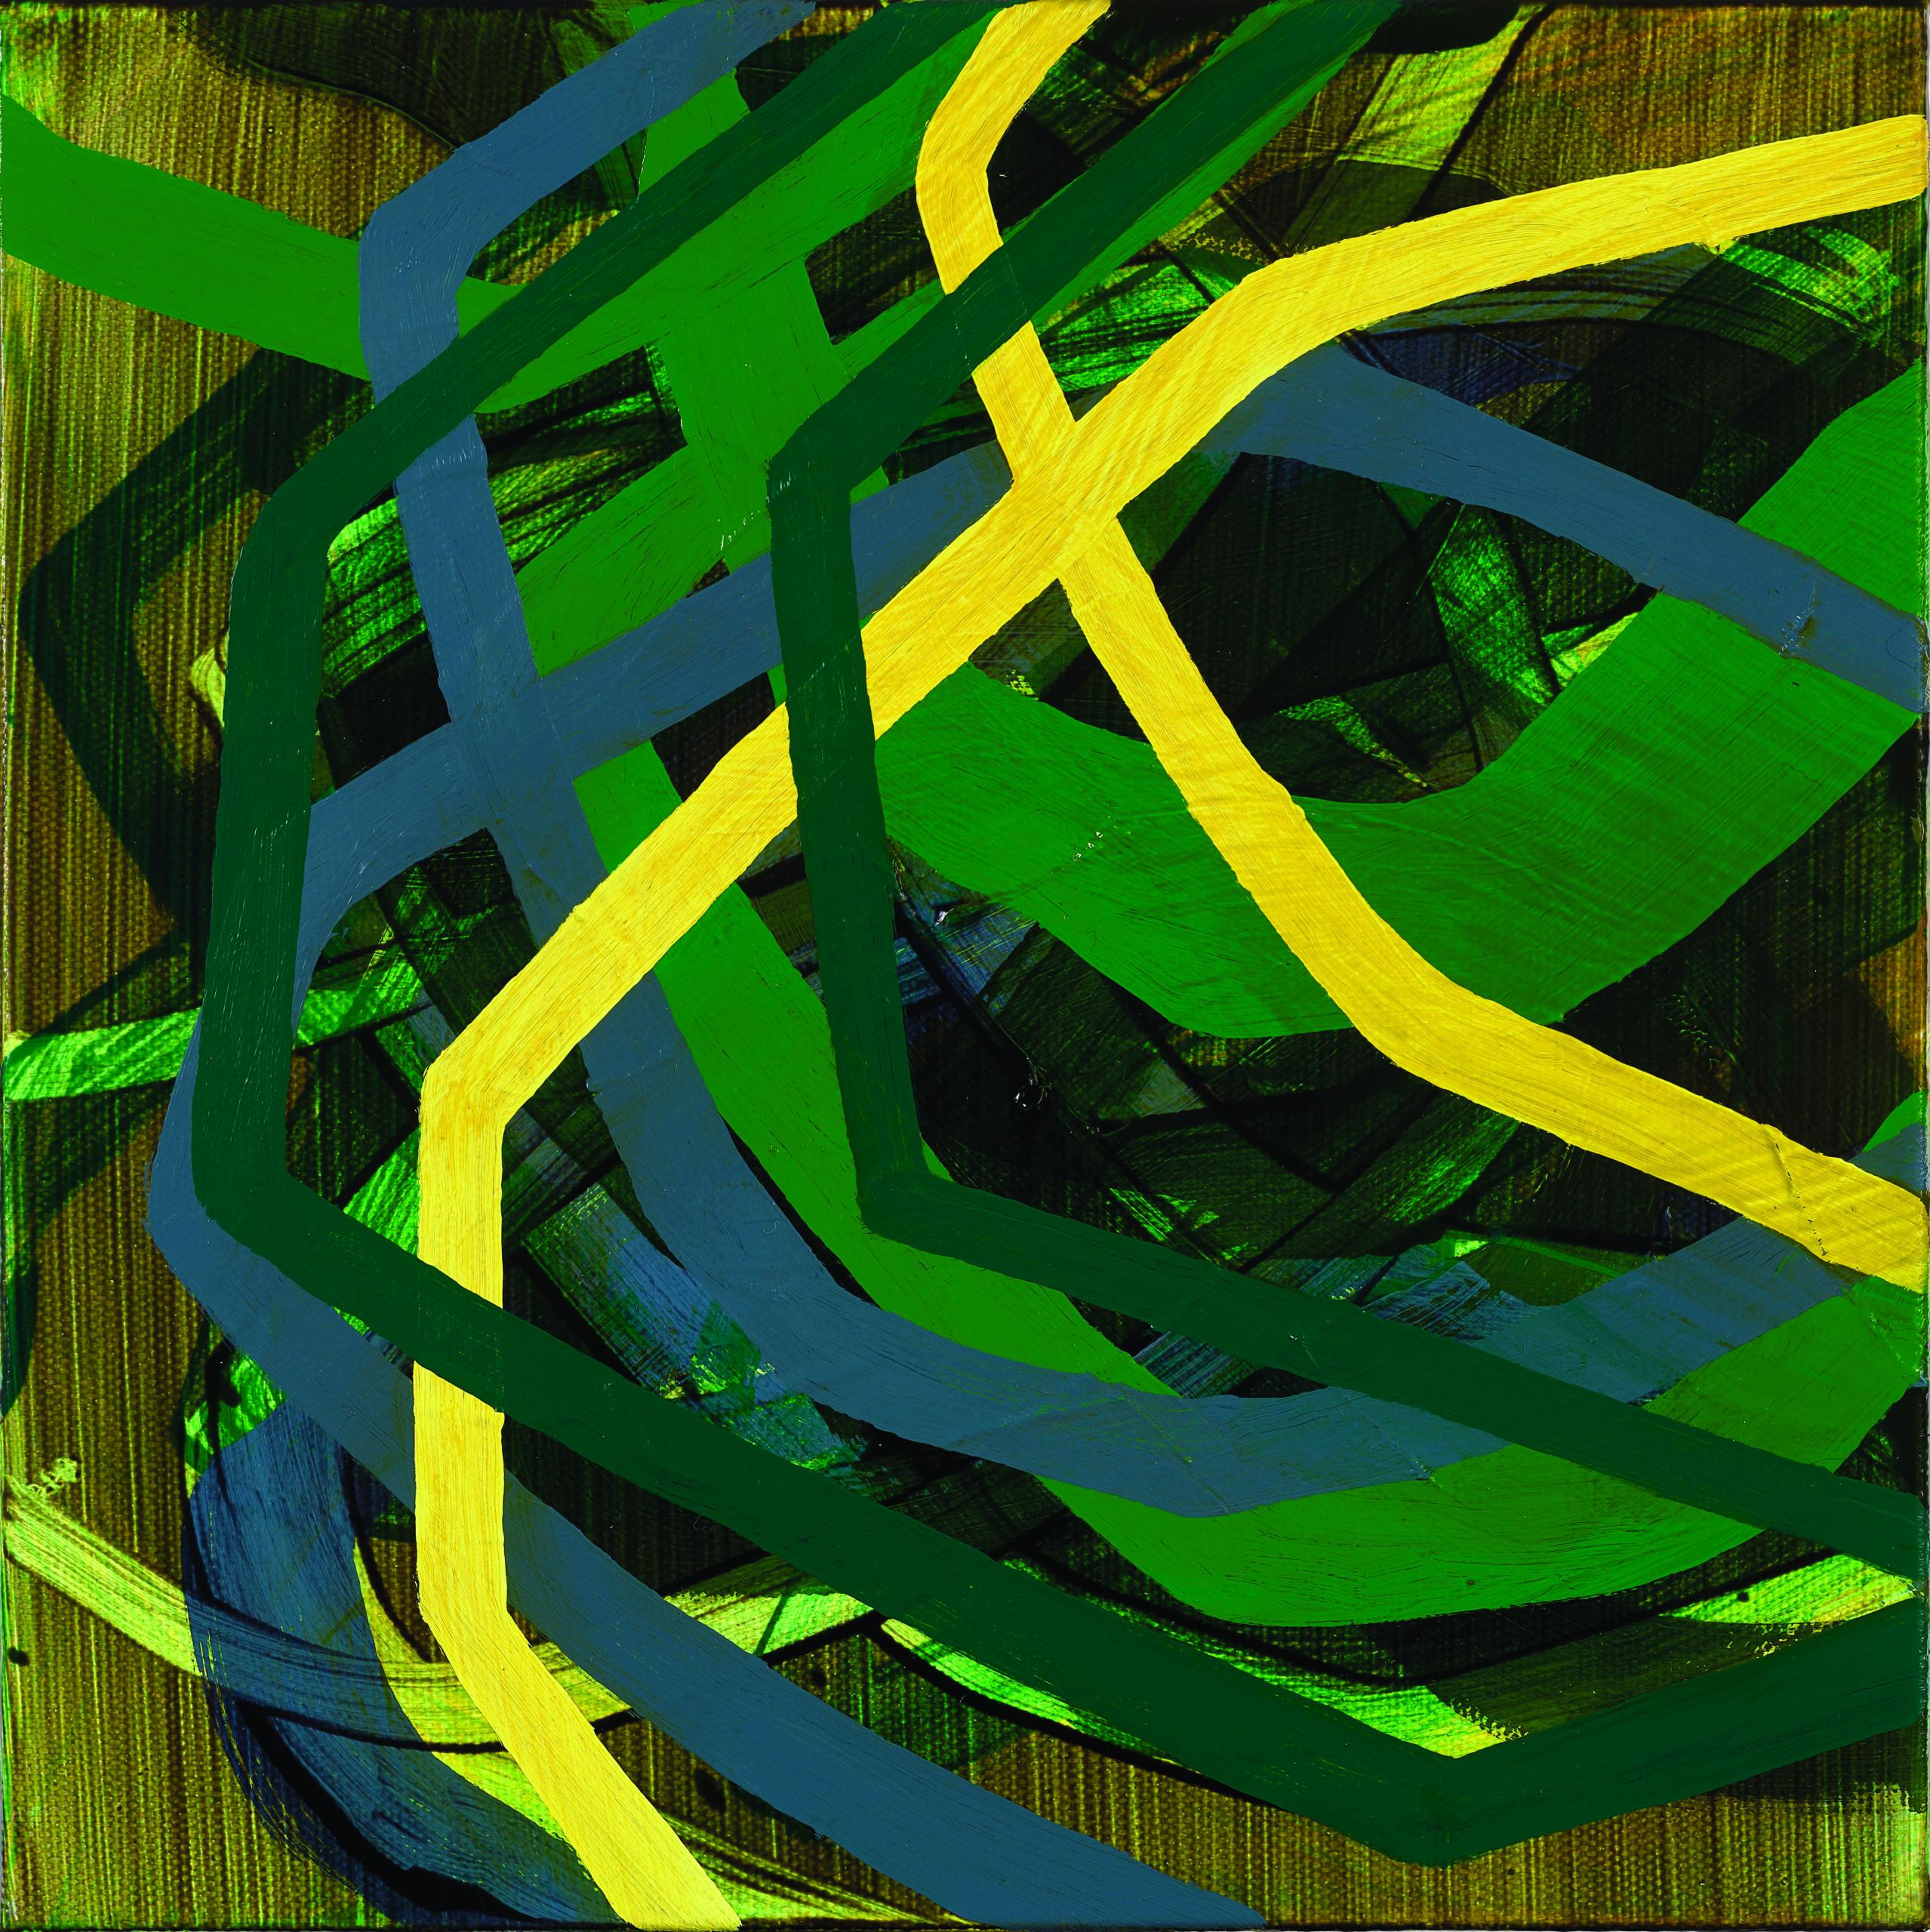 Jennifer Morrison - All The World Is Green (2020)